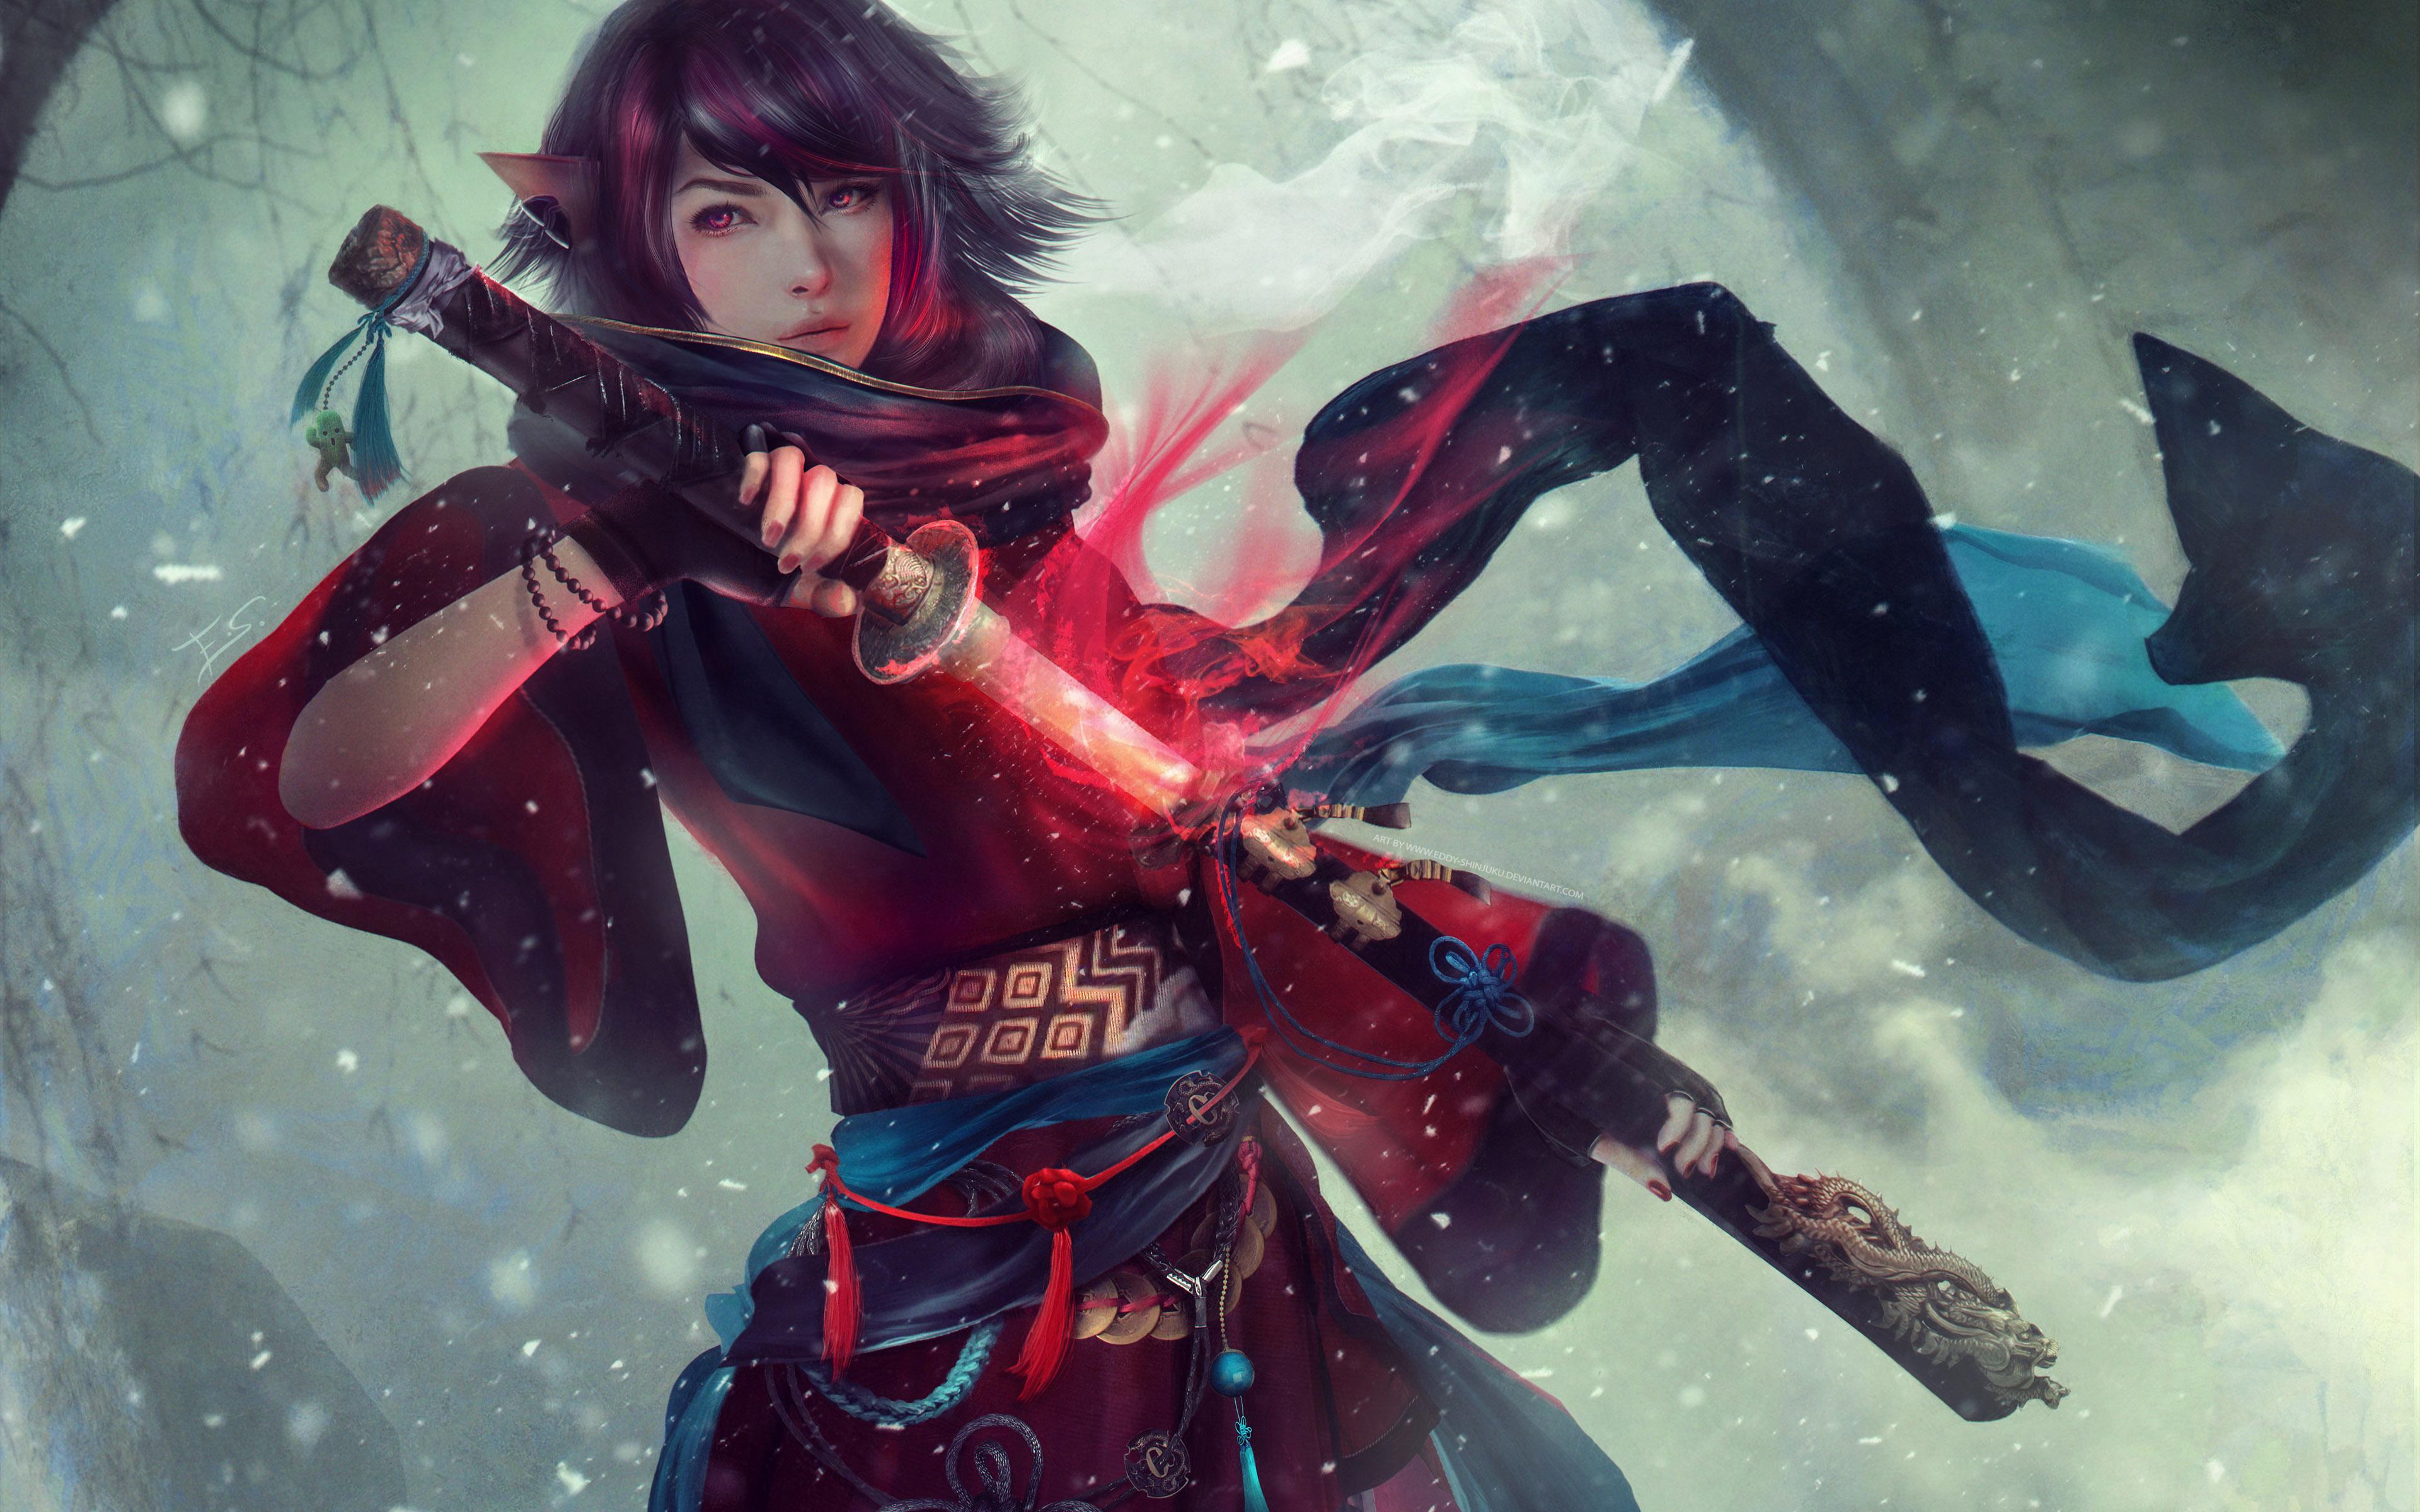 Final Fantasy 4k Hd Games 4k Wallpapers Images: Final Fantasy Original Character 4k, HD Games, 4k